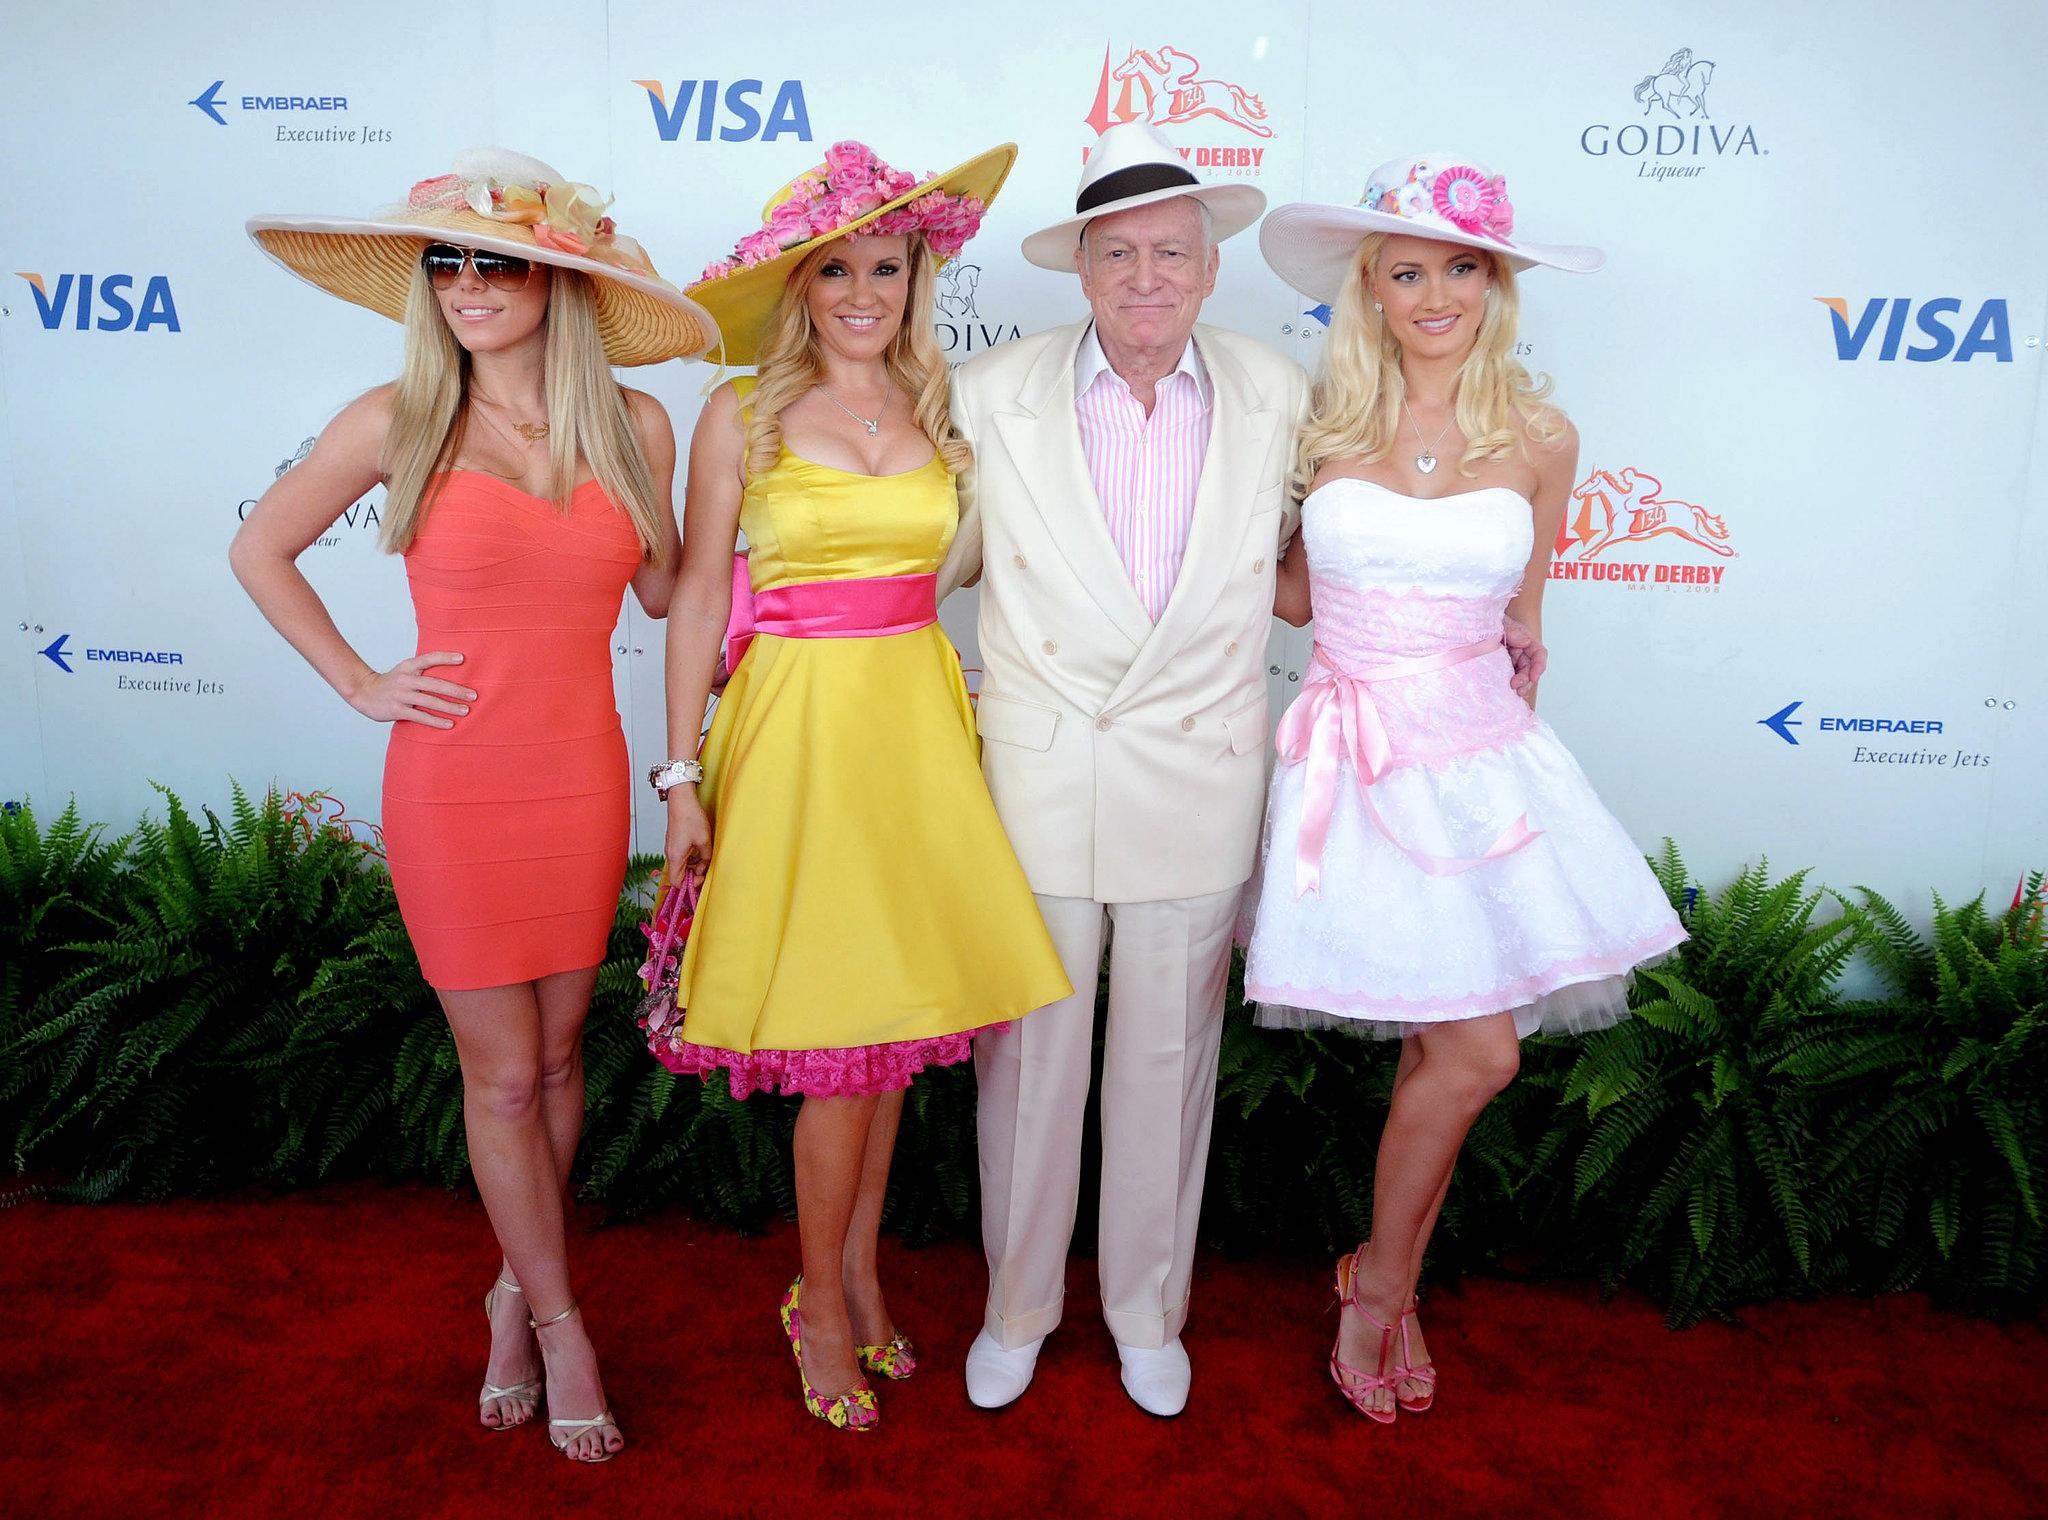 Hugh Hefner brought his then-girlfriends to the 2008 derby.